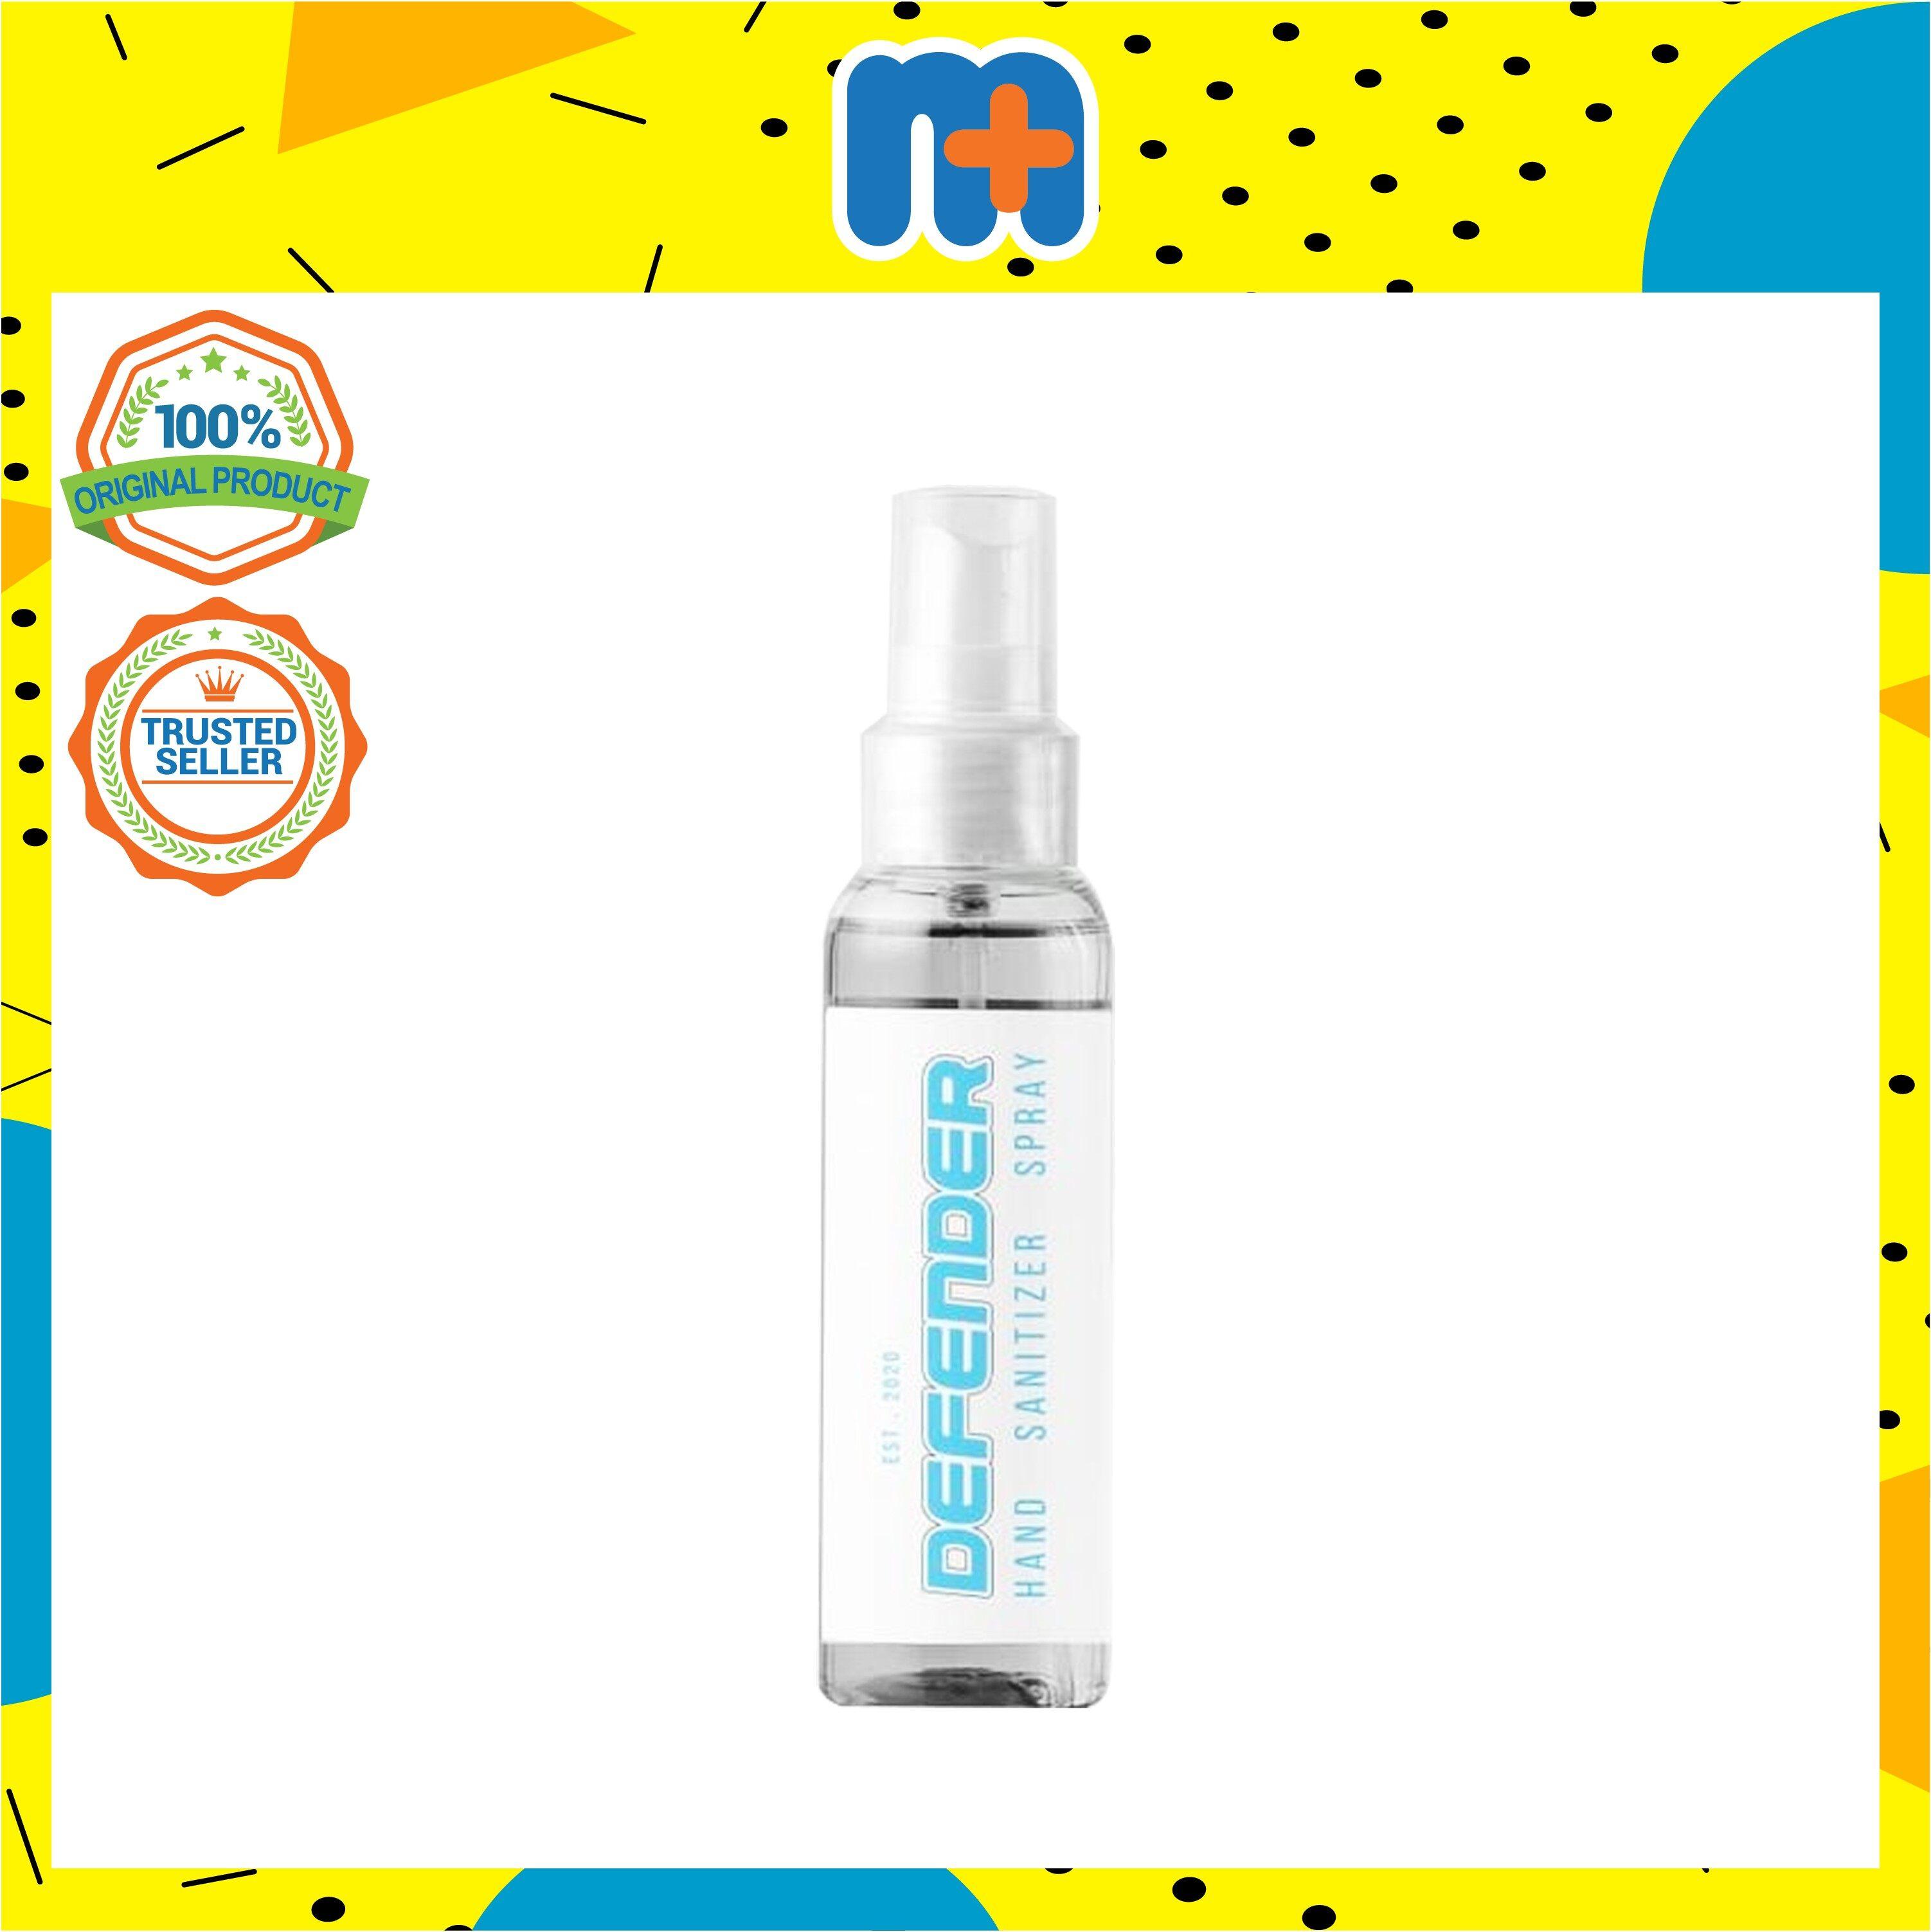 [MPLUS] DEFENDER Sanitizer 60ml Ds-007